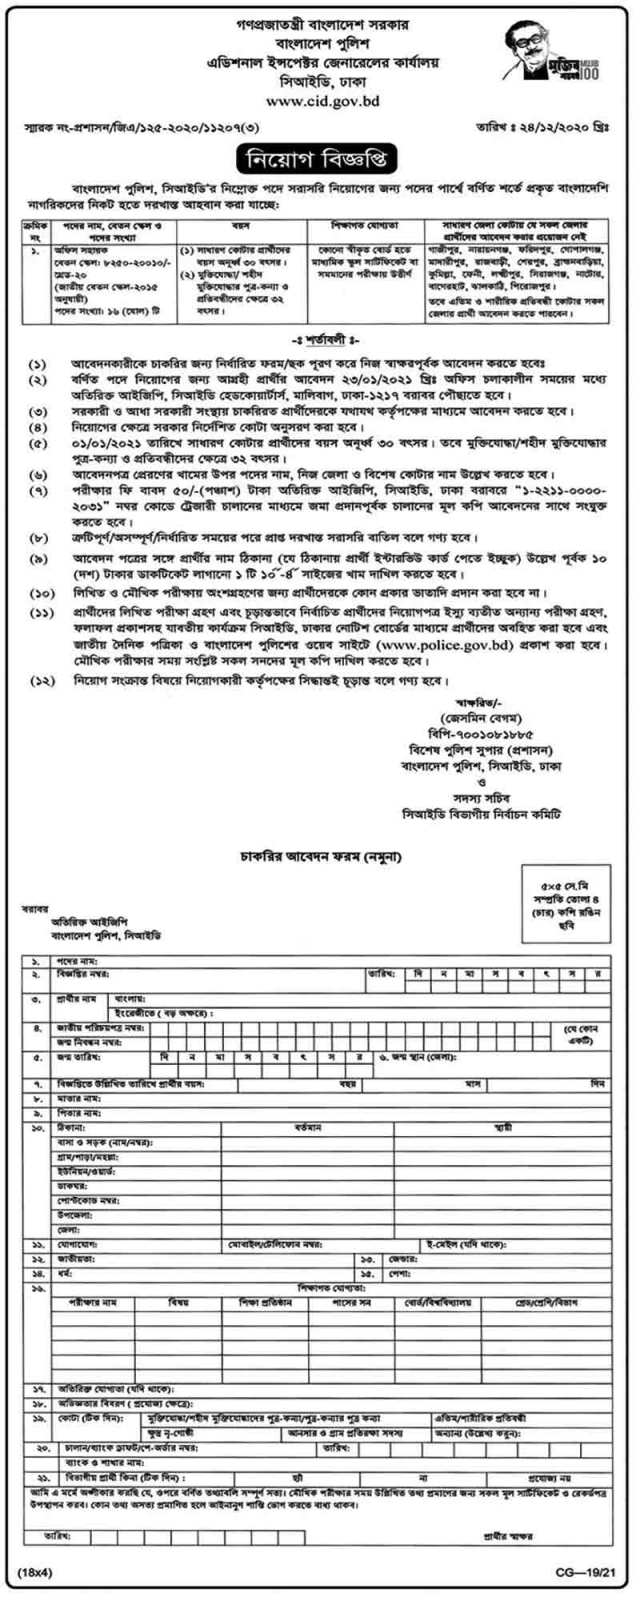 Office of Additional Inspector General CID Job Circular